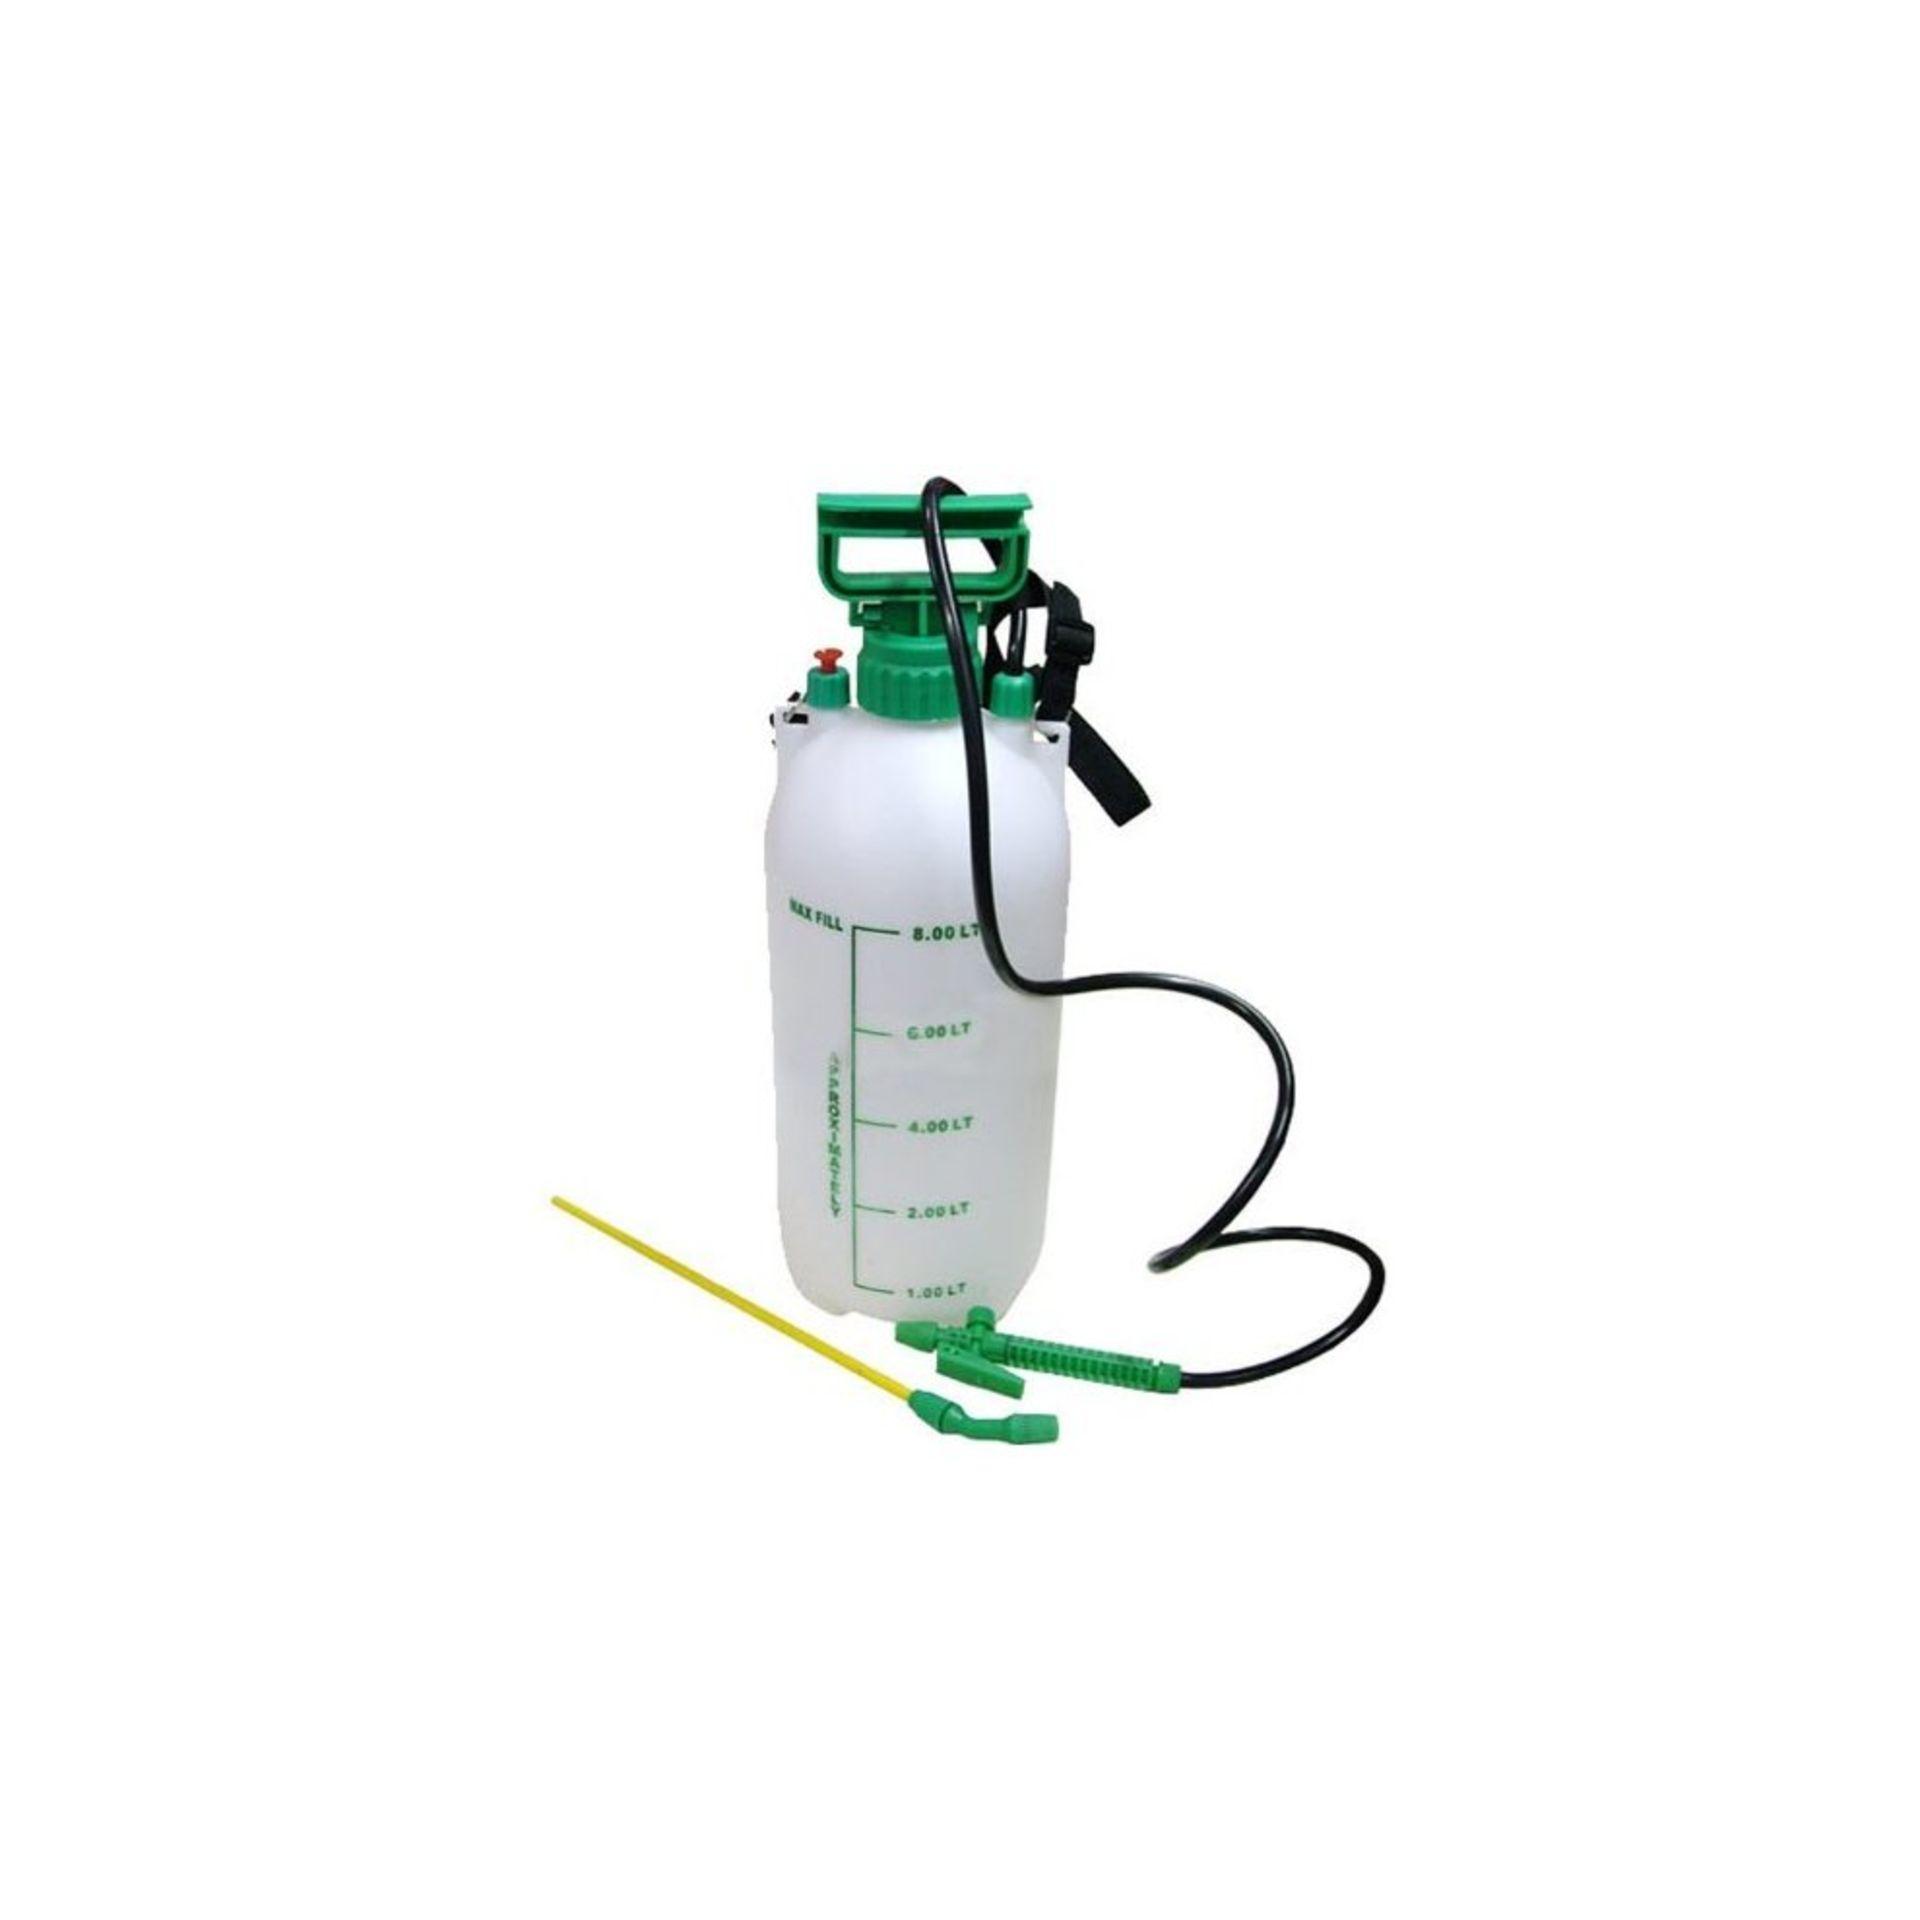 Lot 43029 - V Brand New 8L Pressure Sprayer